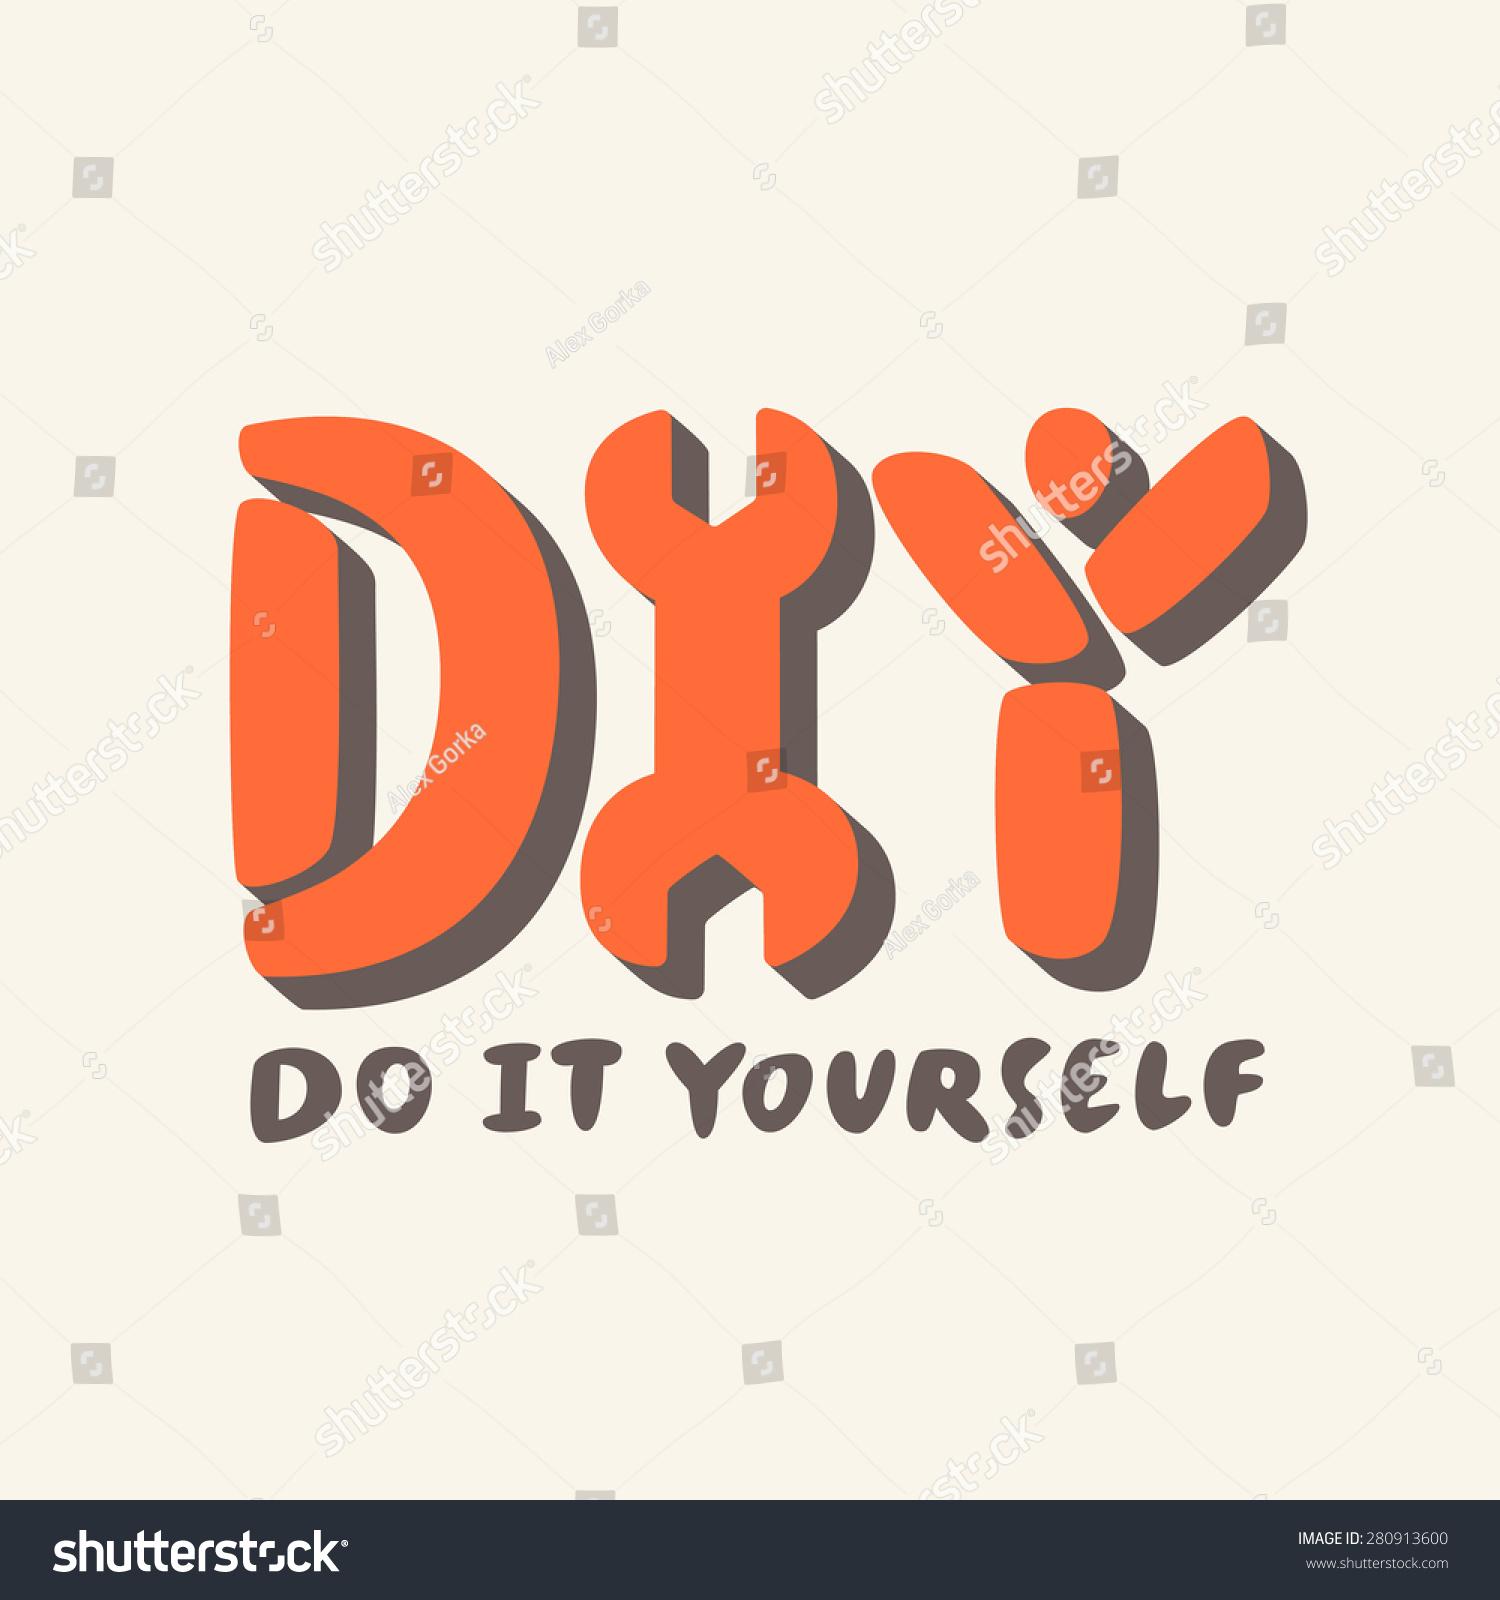 Diy do yourself stock vector 280913600 shutterstock do it yourself solutioingenieria Choice Image